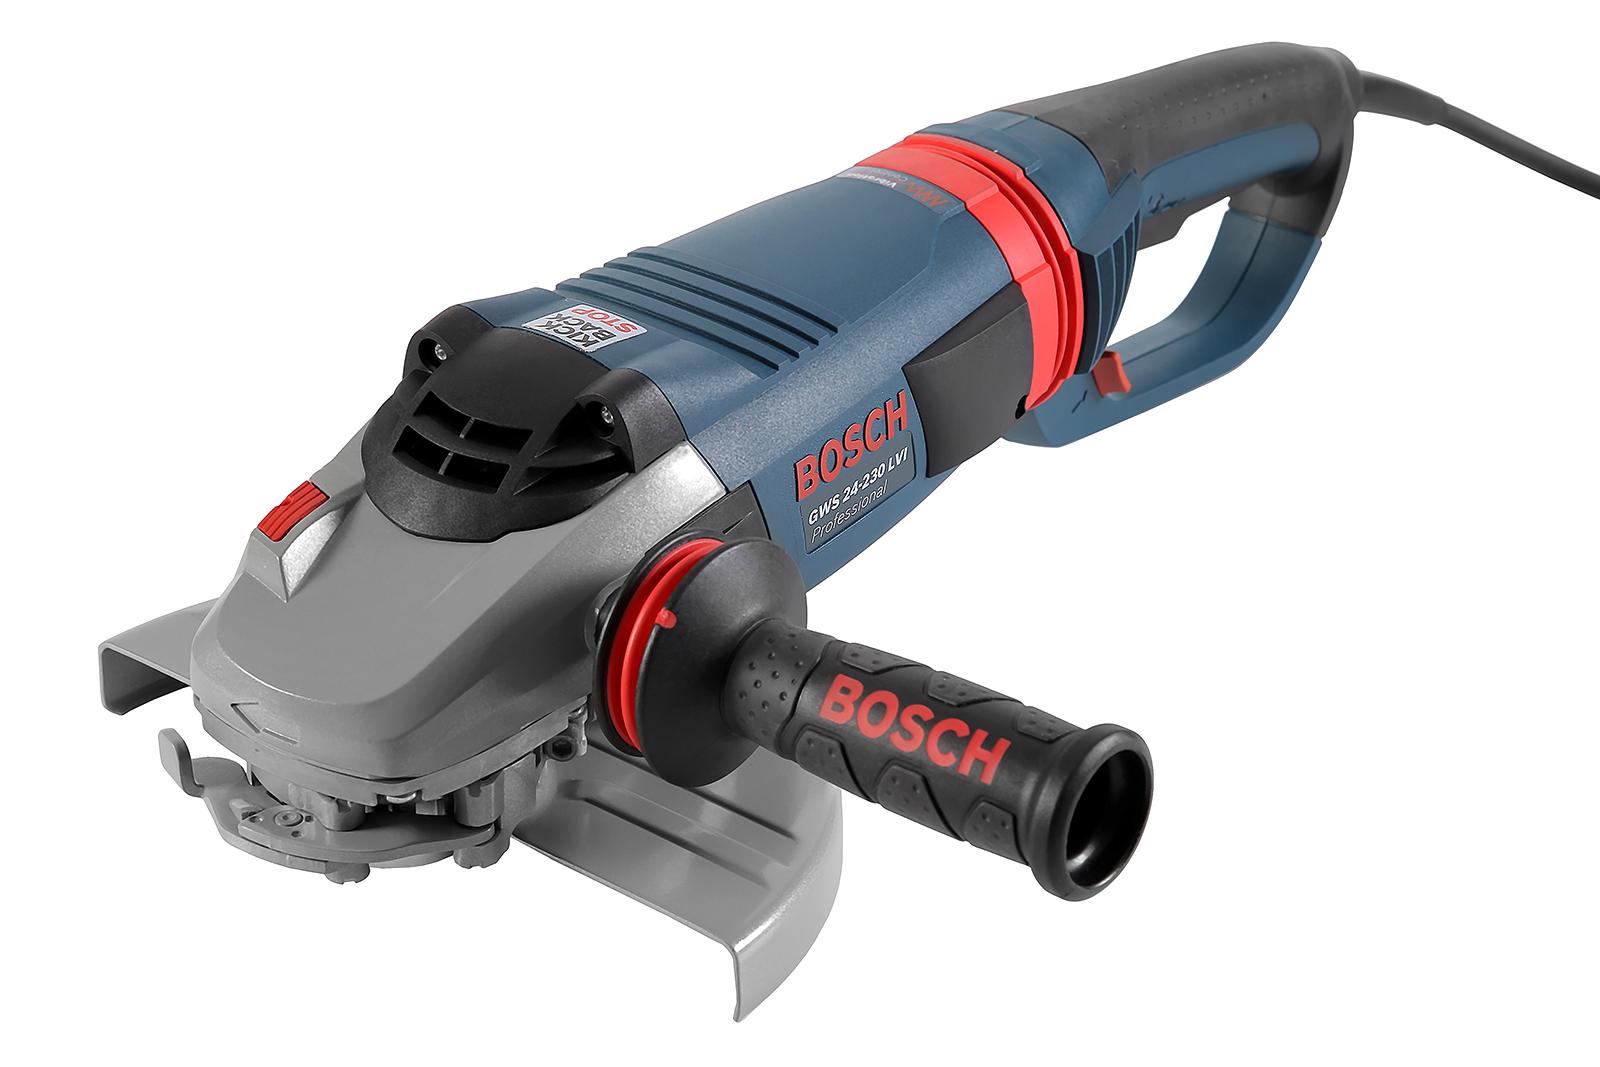 УШМ (болгарка) Bosch Gws 24-230 lvi (0.601.893.f00) угловая шлифмашина bosch gws 26 230 lvi 0 601 895 f04